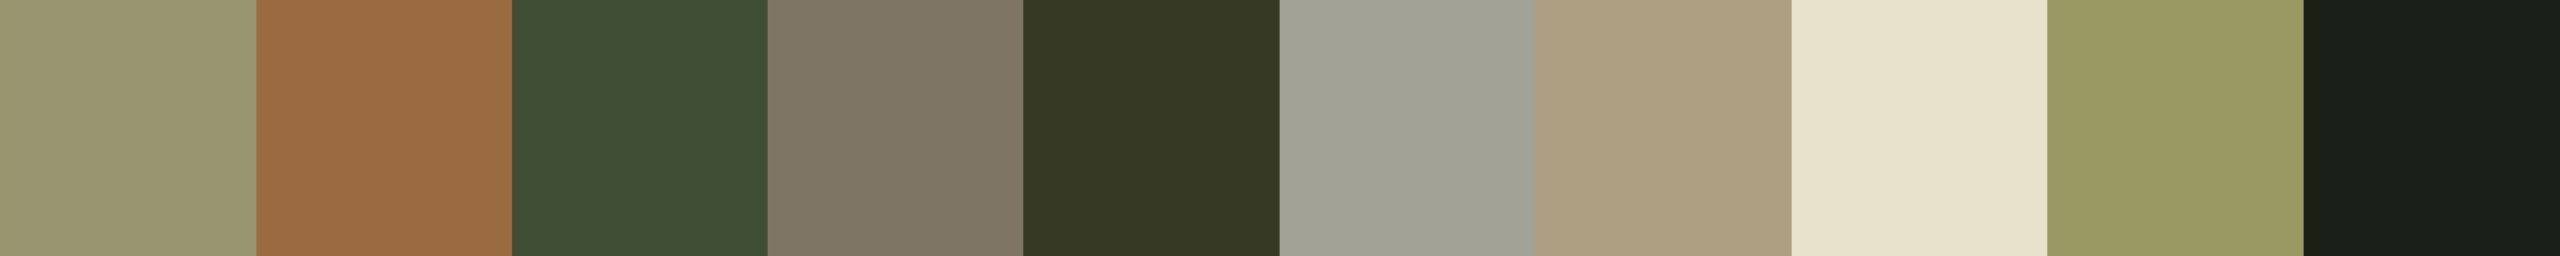 4 Arazola Color Palette